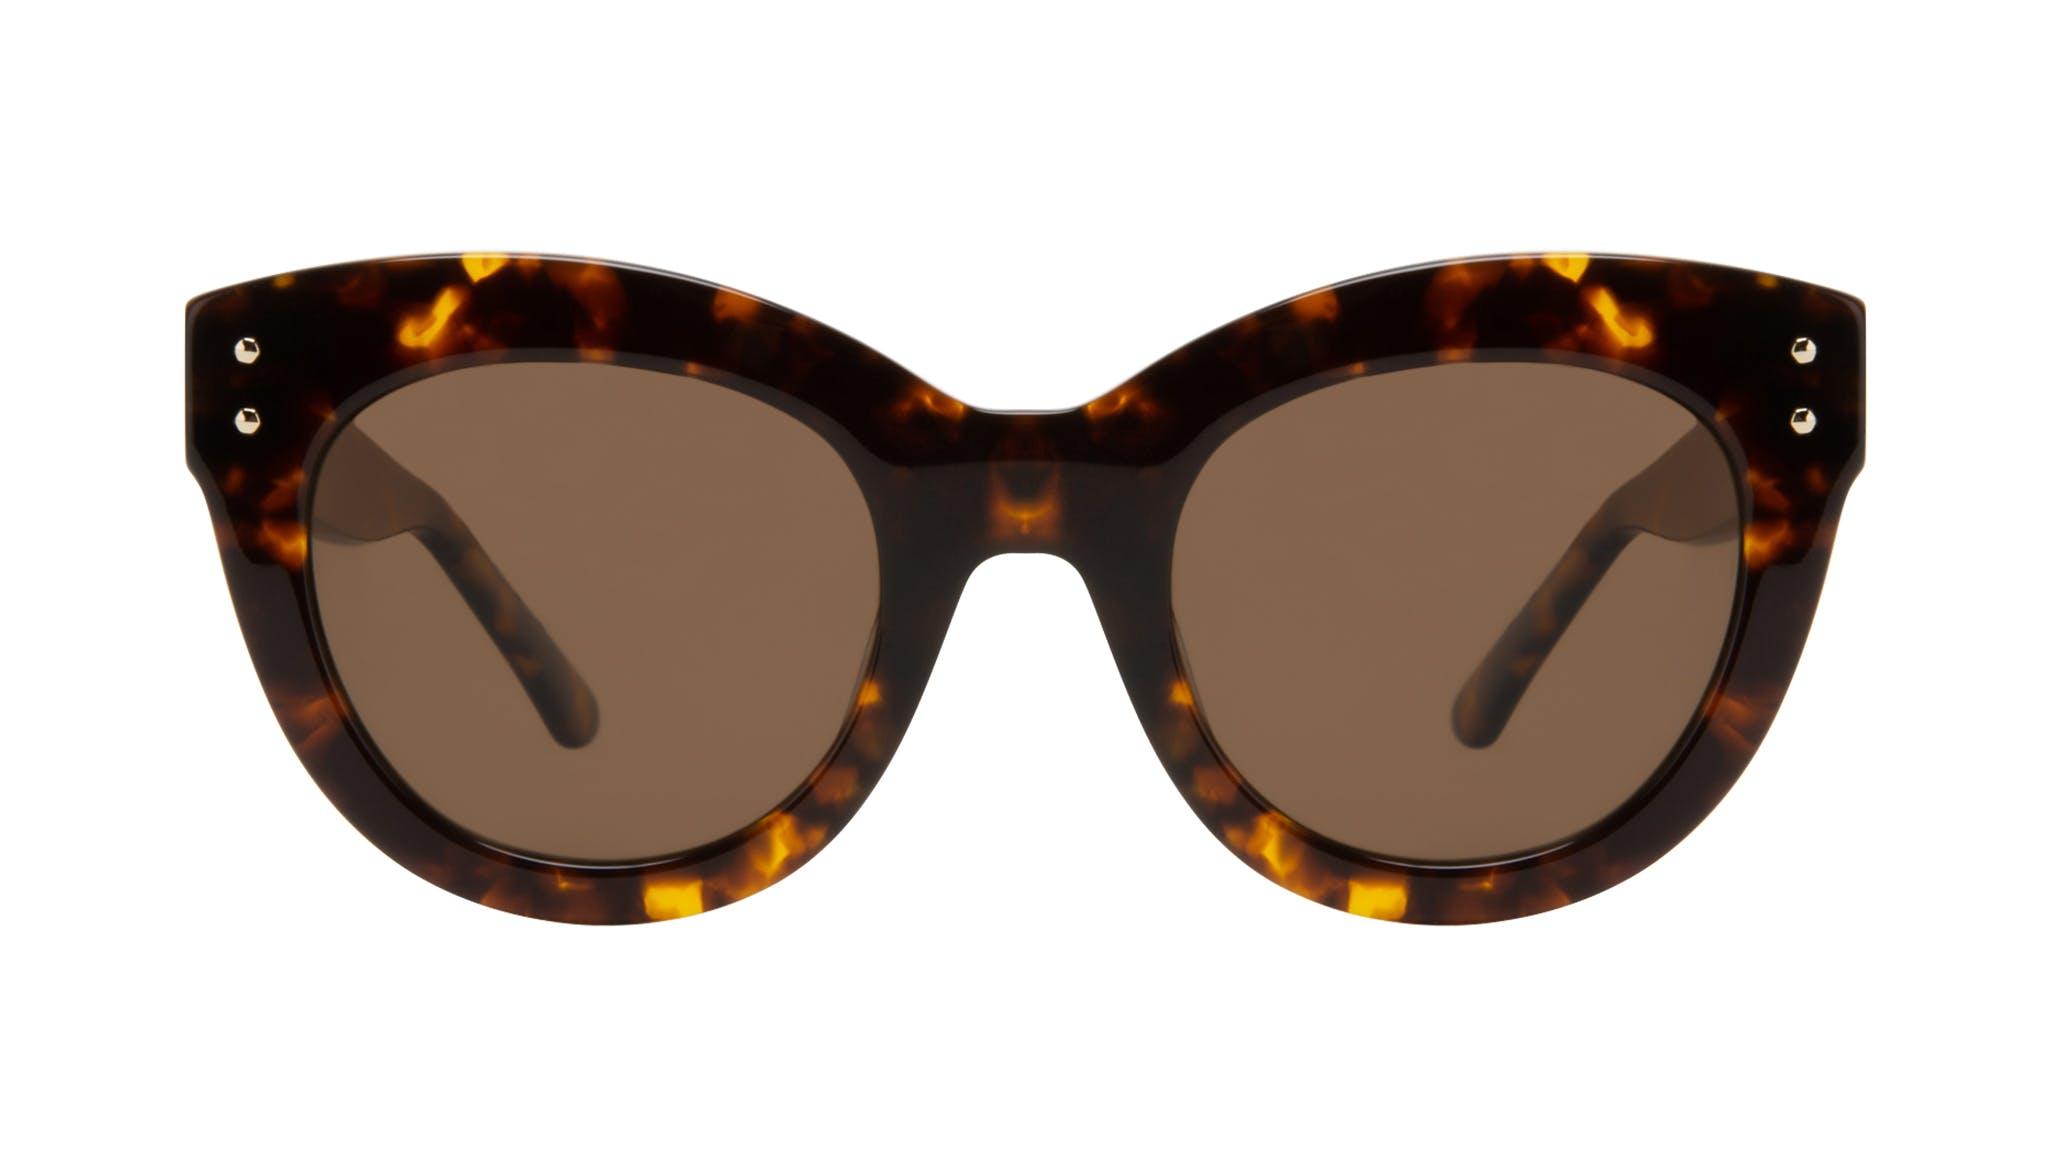 Affordable Fashion Glasses Cat Eye Sunglasses Women Groove Tortoise